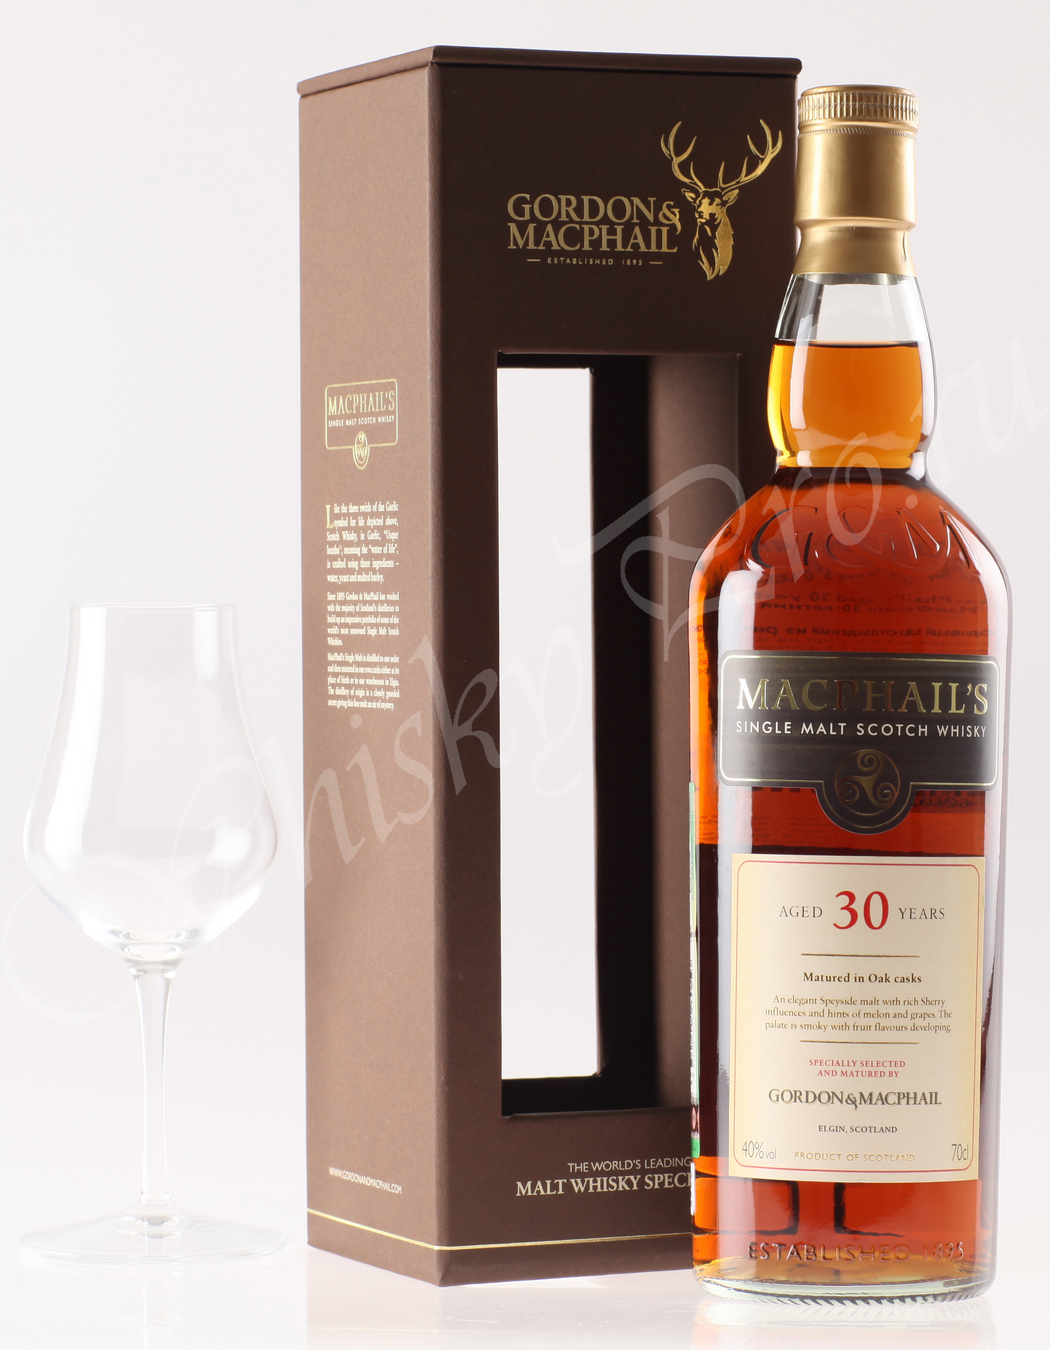 Виски Macphails 30 years виски Макфейлс 30 лет